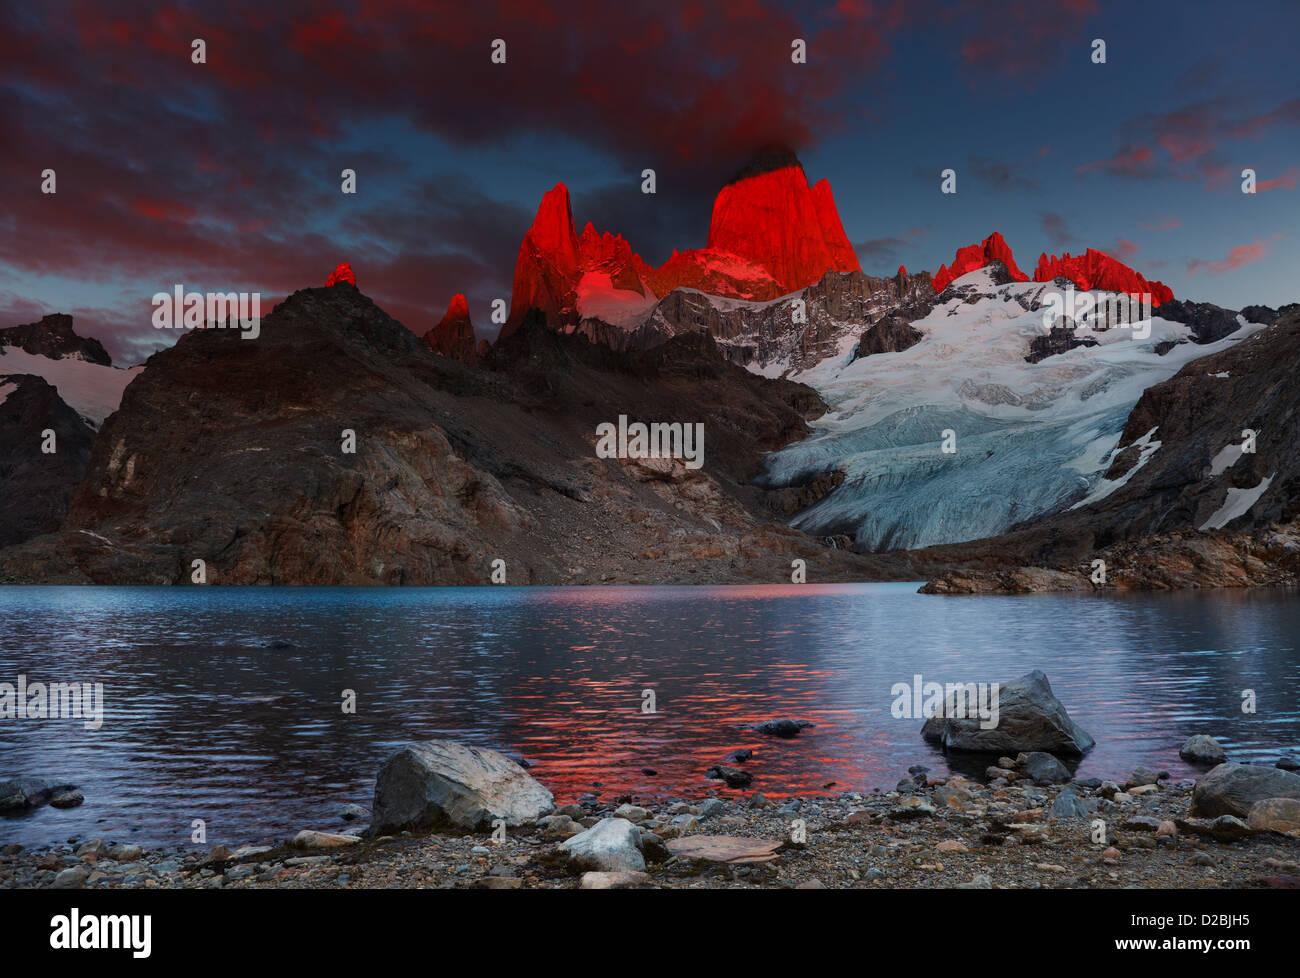 Laguna de Los Tres and mount Fitz Roy, Dramatical sunrise, Patagonia, Argentina - Stock Image